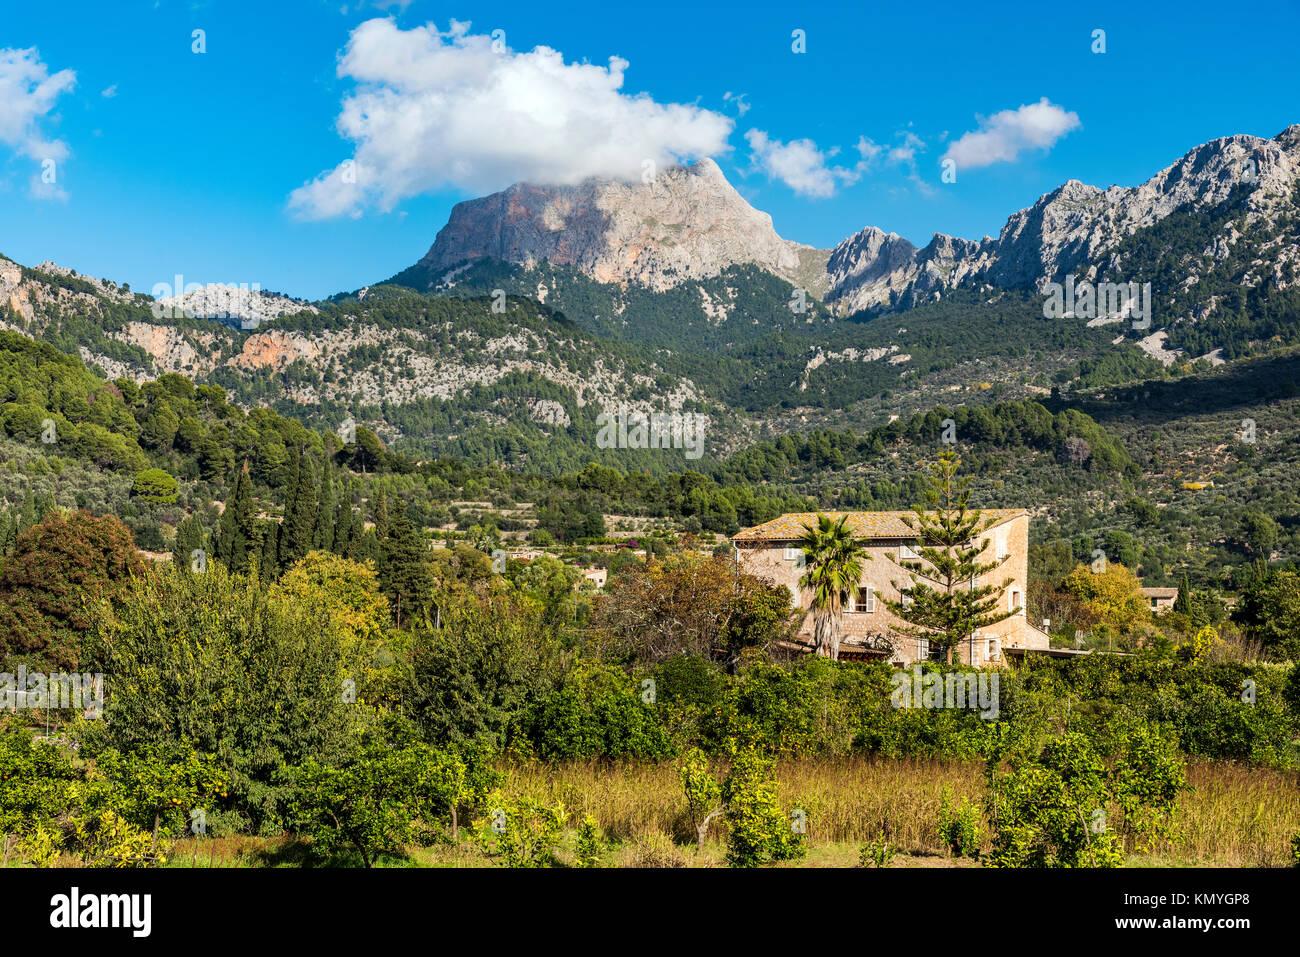 Mount Puig Major, the highest peak on Majorca, located in the Serra de Tramuntana mountain range, Fornalutx, Majorca, - Stock Image